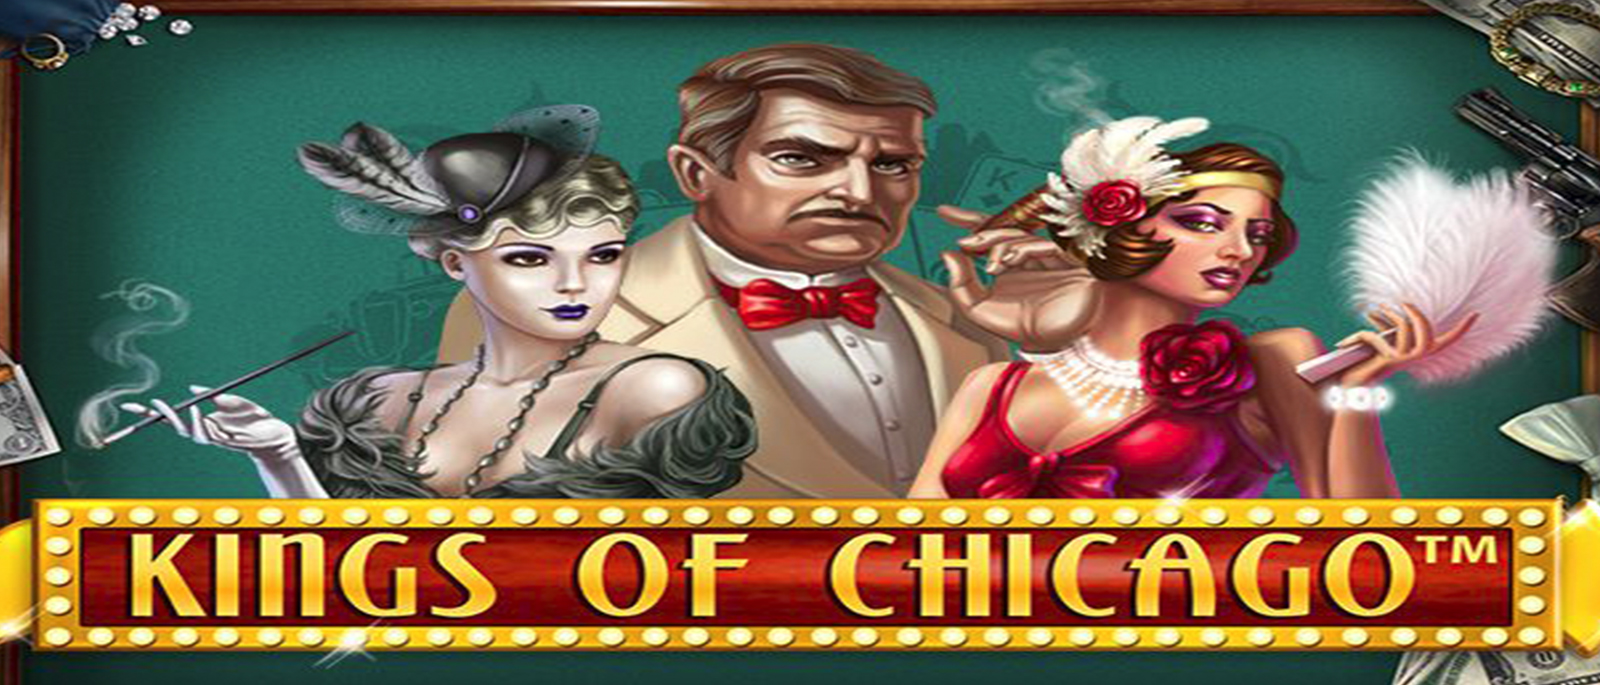 Kings of Chicago Net entertainment Videospielautomat